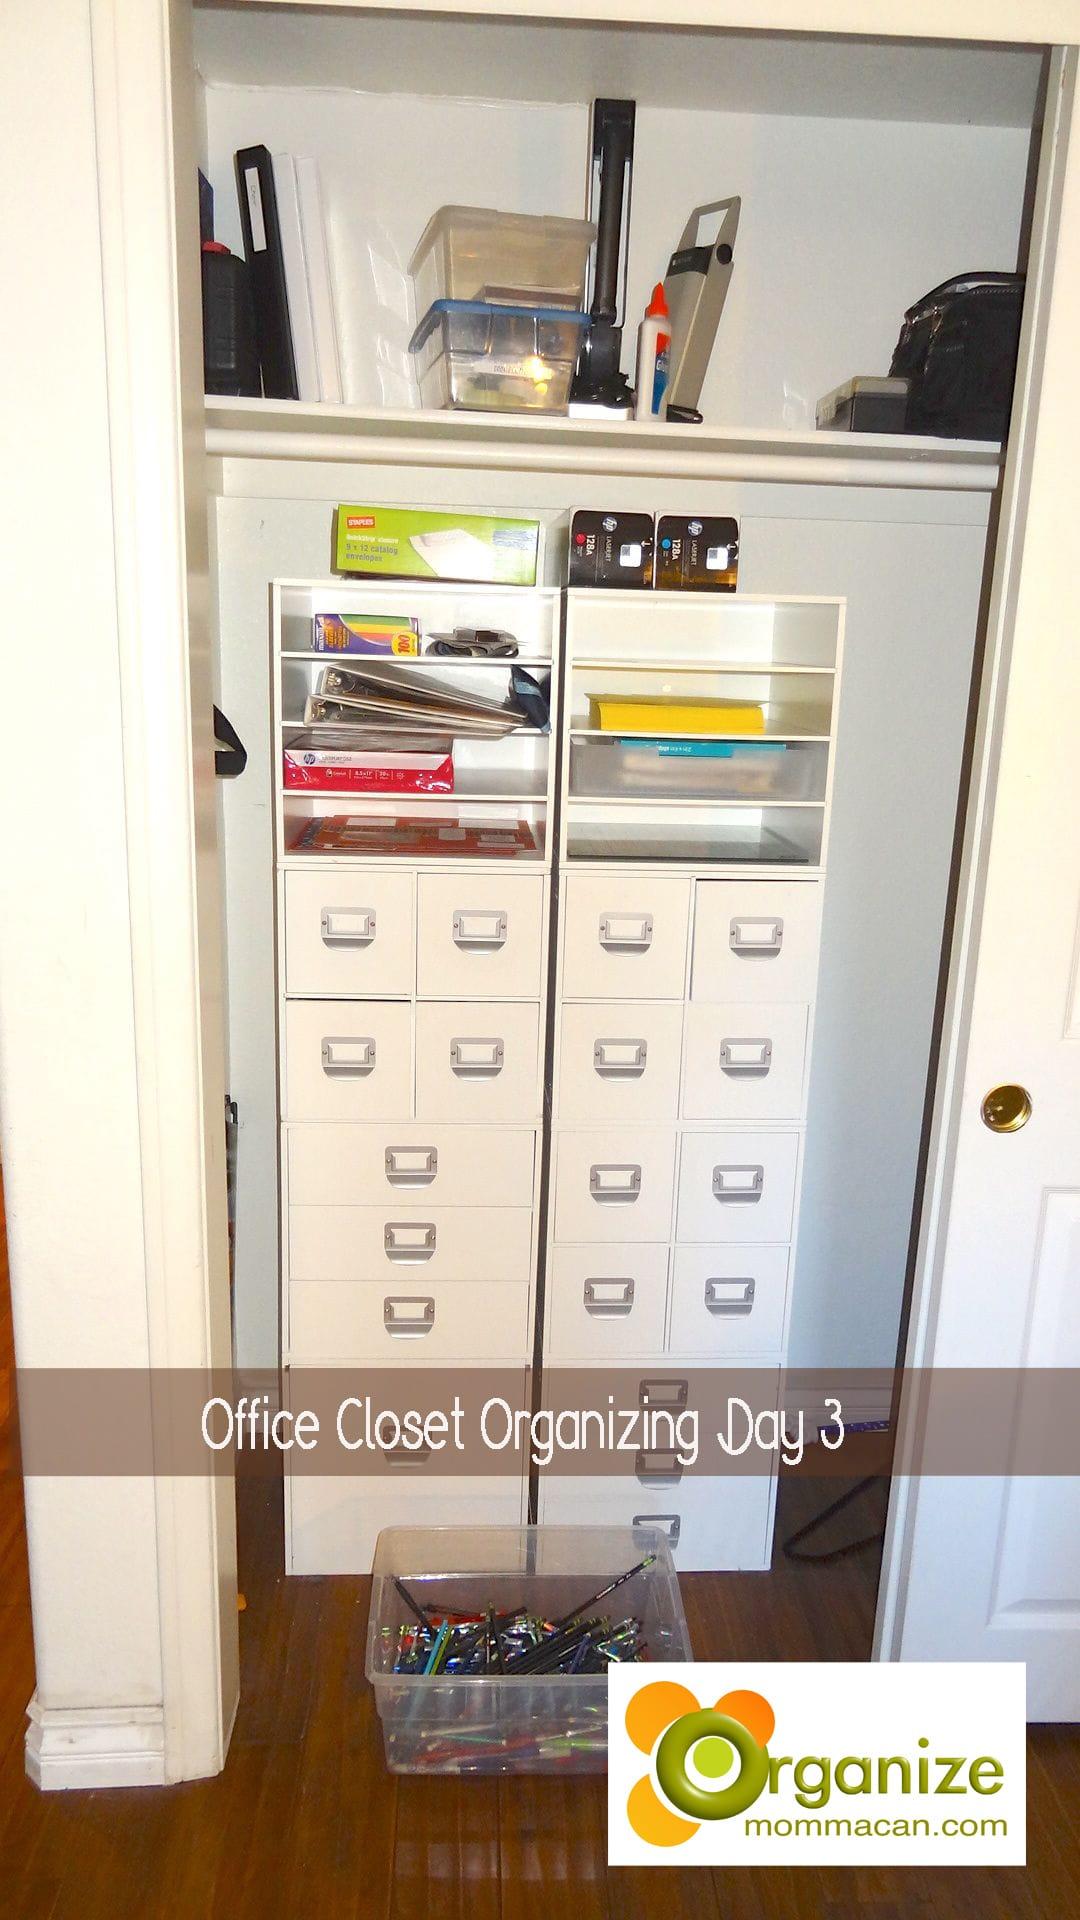 Day 3 Of Organizing My Office Closet